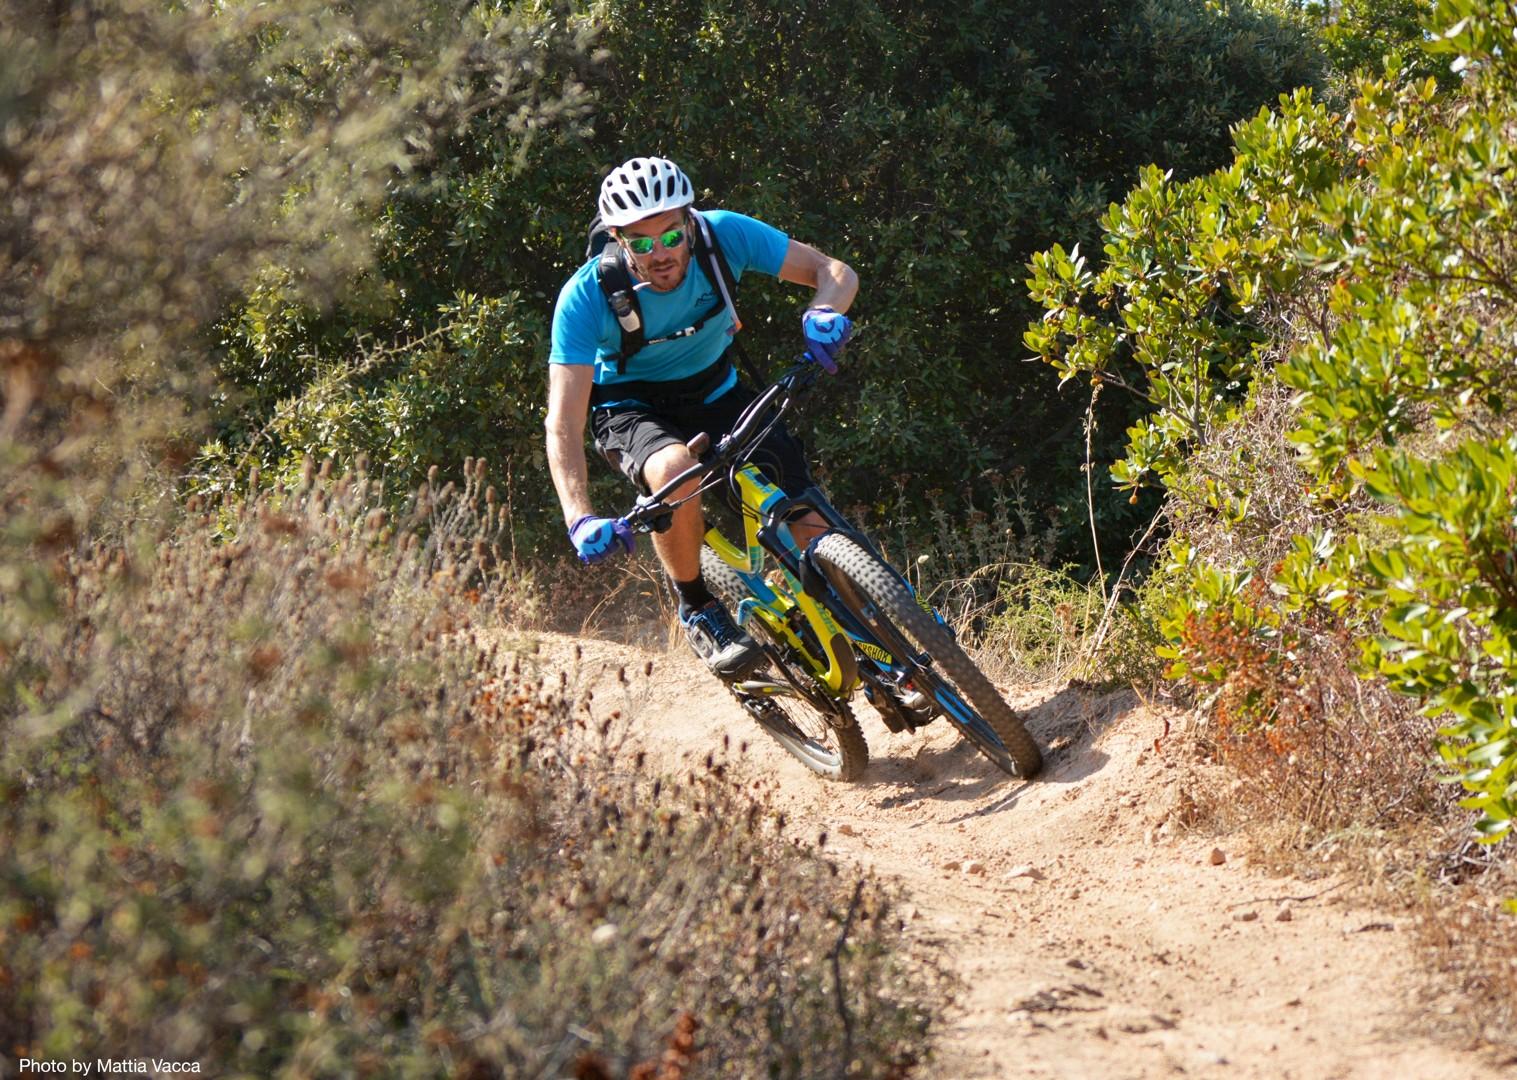 sardinian-enduro-italy-guided-mountain-bike-holiday.jpg - Sardinia - Sardinian Enduro - Guided Mountain Bike Holiday - Italia Mountain Biking